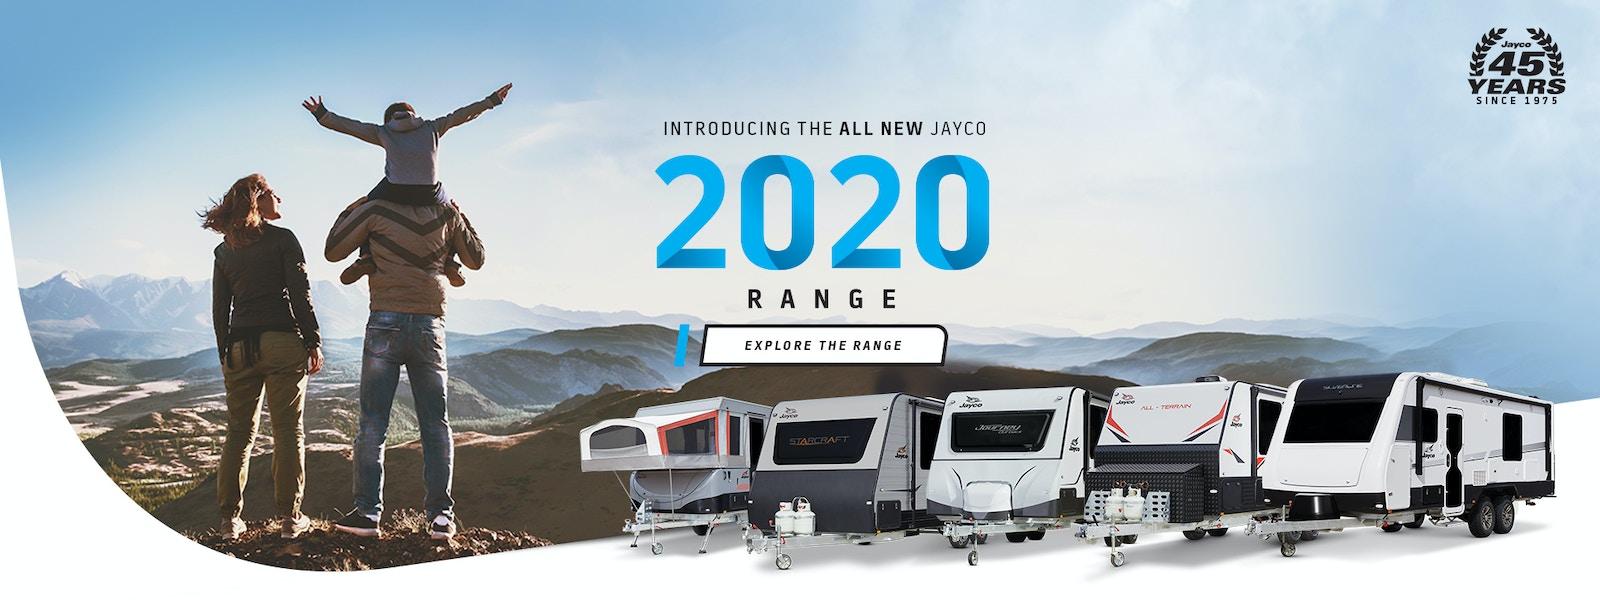 Jayco 2020 Range